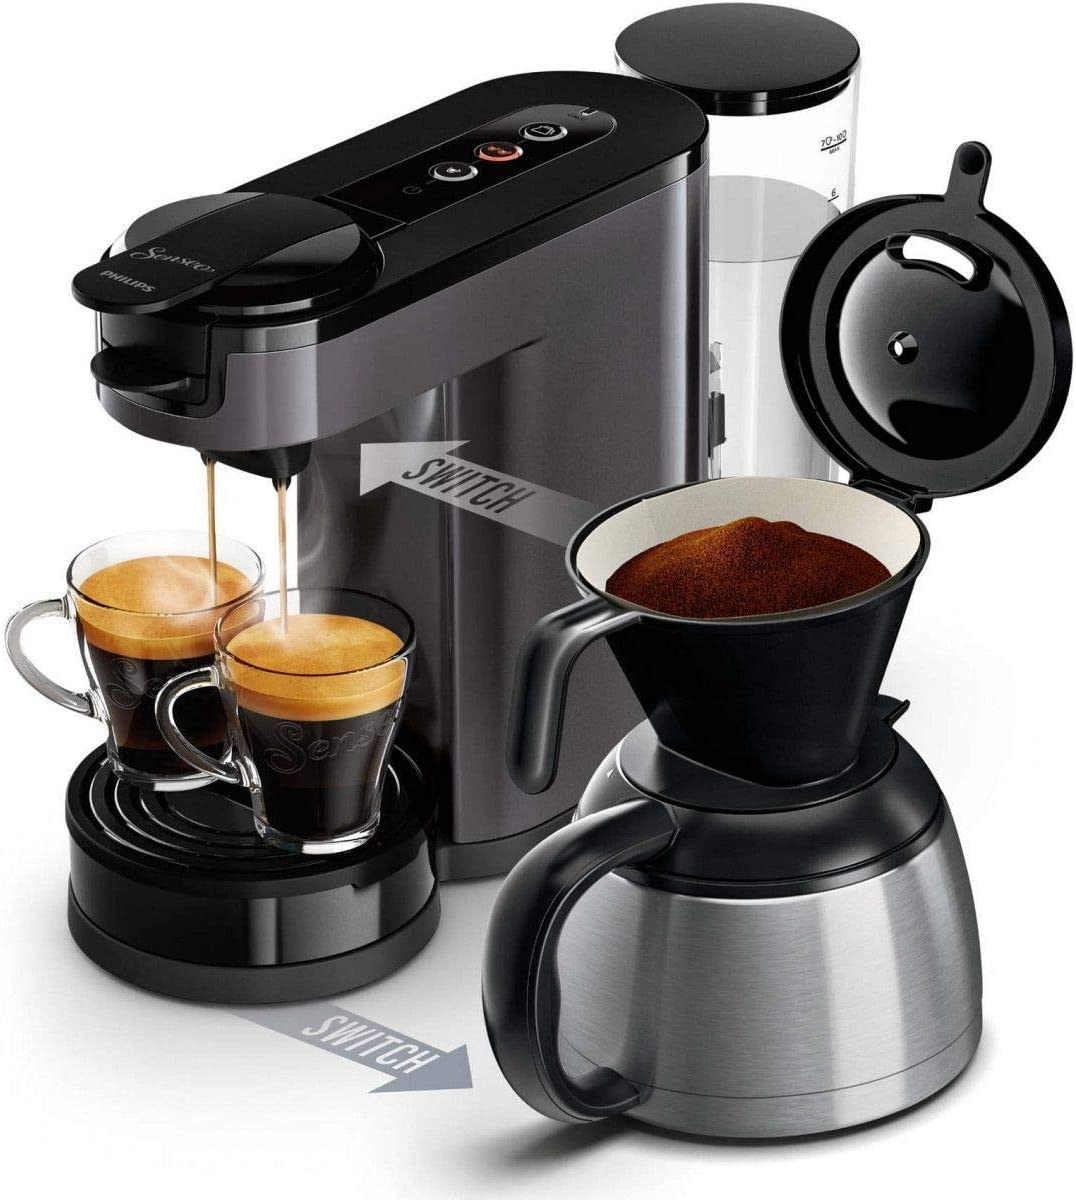 Cafetera Independiente, Cafetera de filtro, 1 L, Dosis de caf/é, De caf/é molido, 1450 W, Negro, Gris, Acero inoxidable Senseo HD6591//21